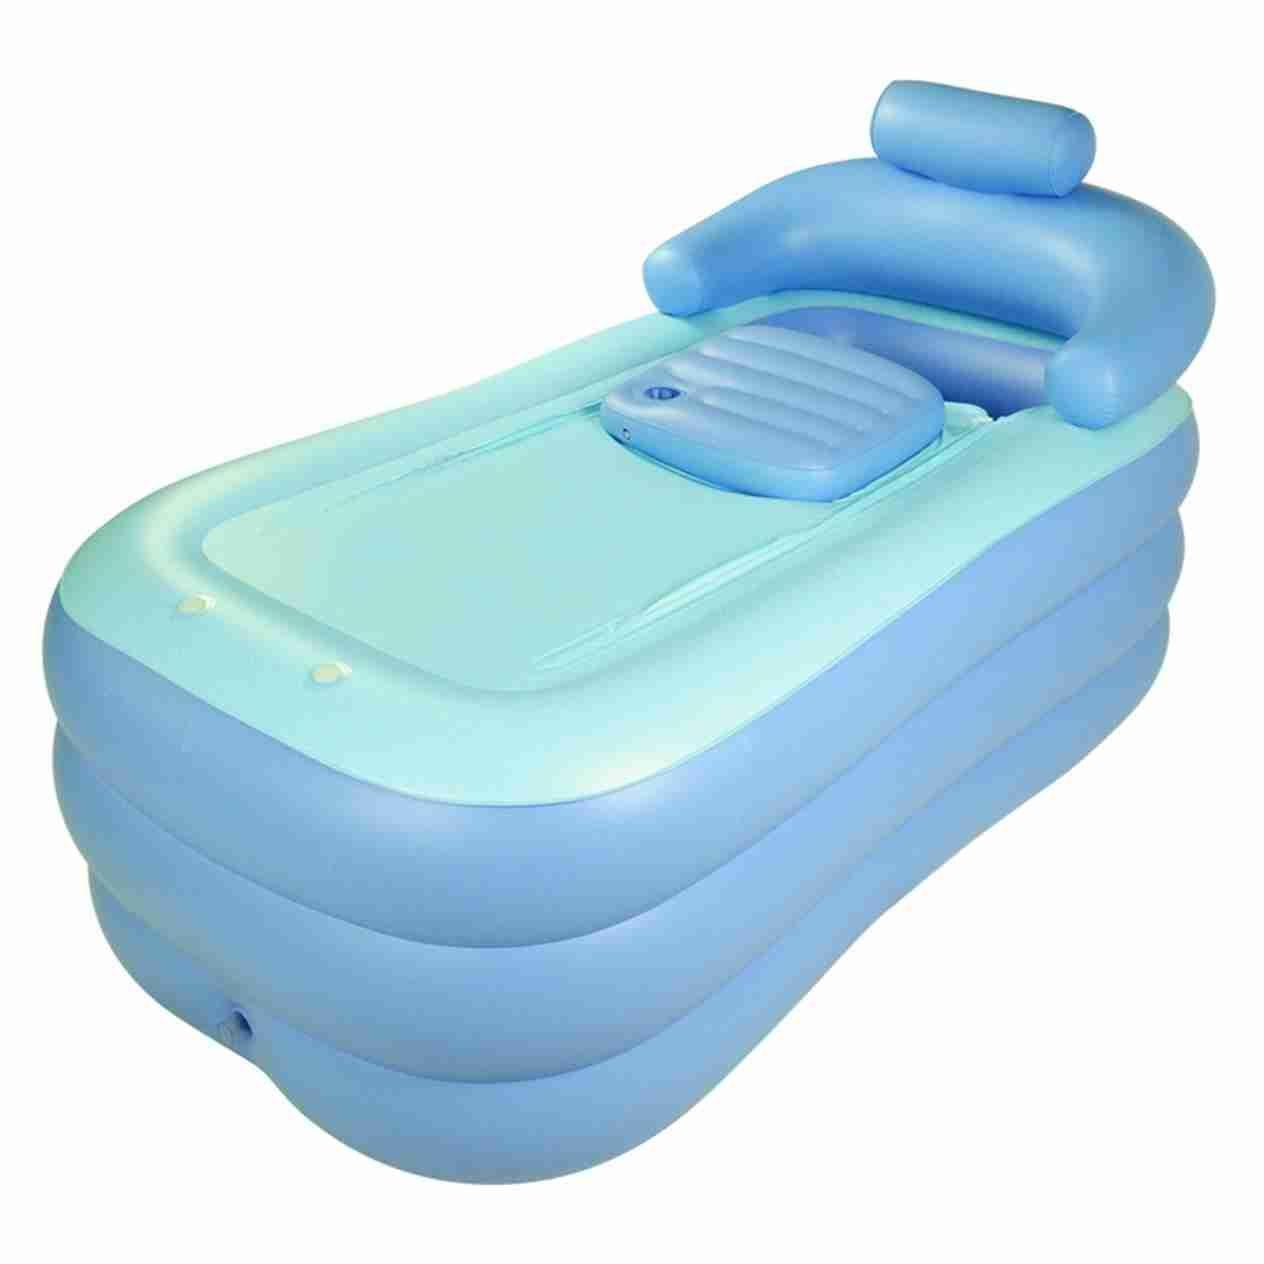 New post Trending-portable jacuzzi for bathtubs-Visit-entermp3.info ...